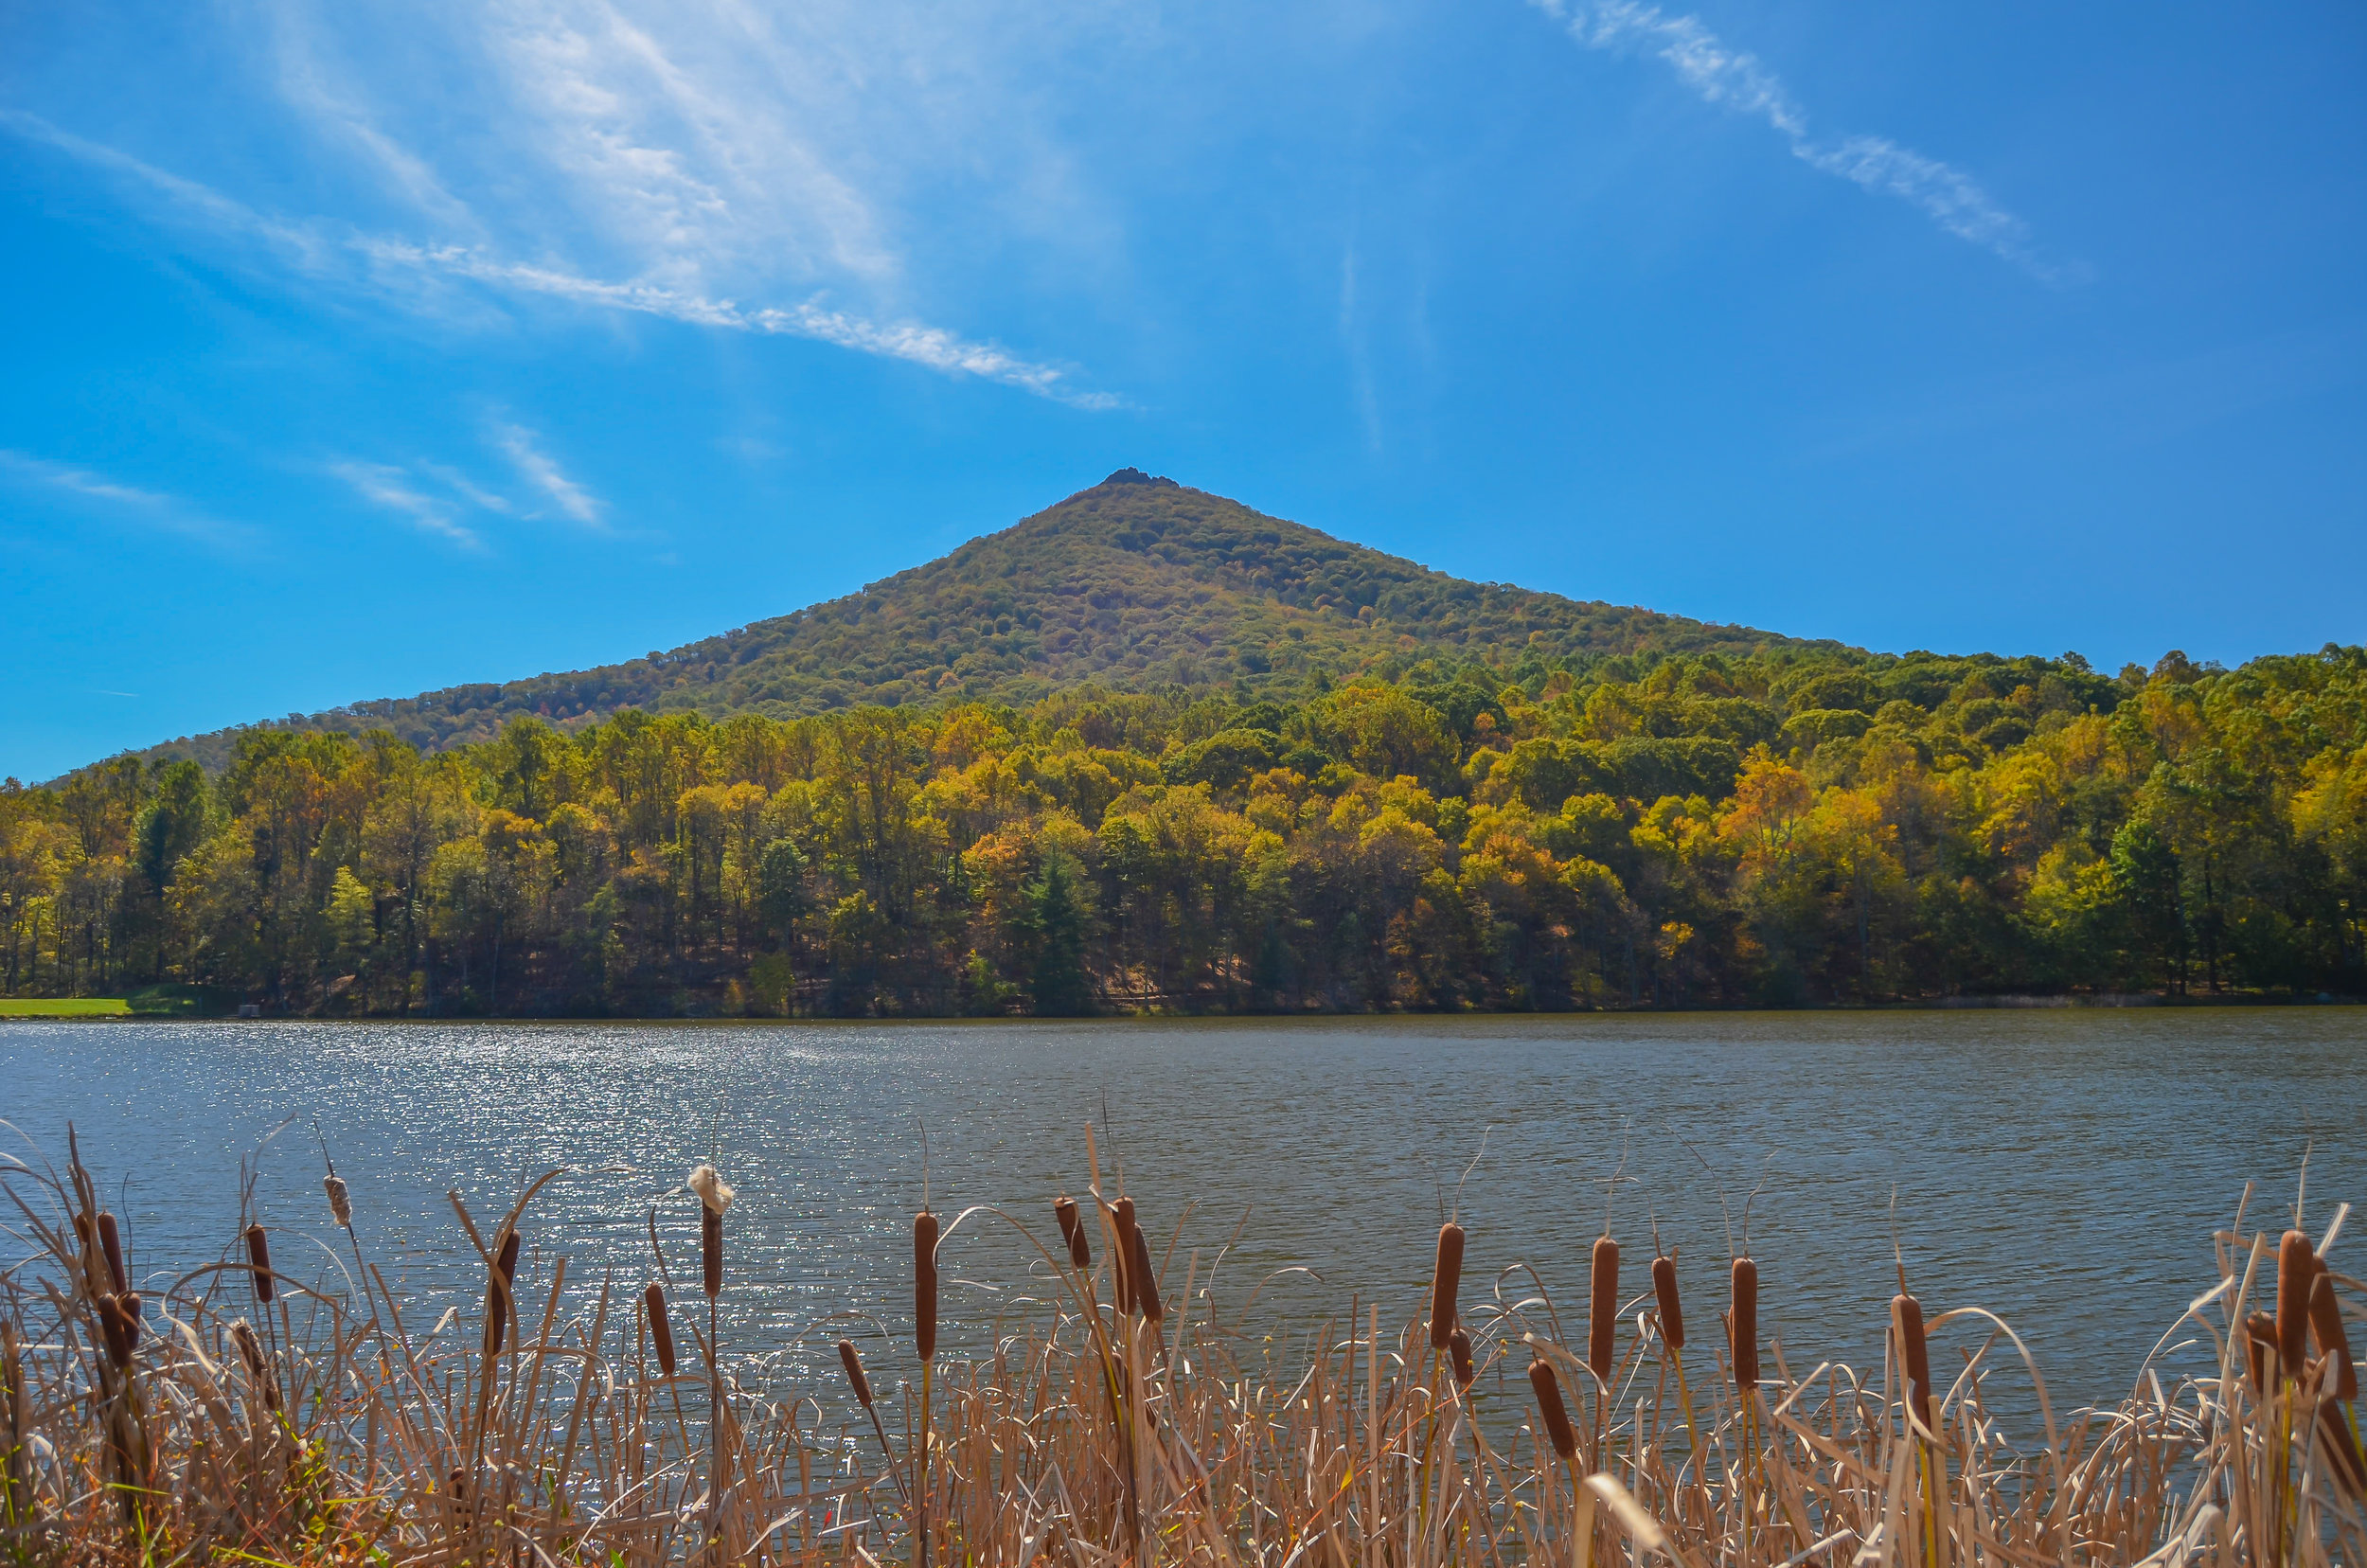 sharptop mountain-peaks of otter-lake abbott-otter crek falls-blue ridge mountains-fall-autumn-virginia.jpg